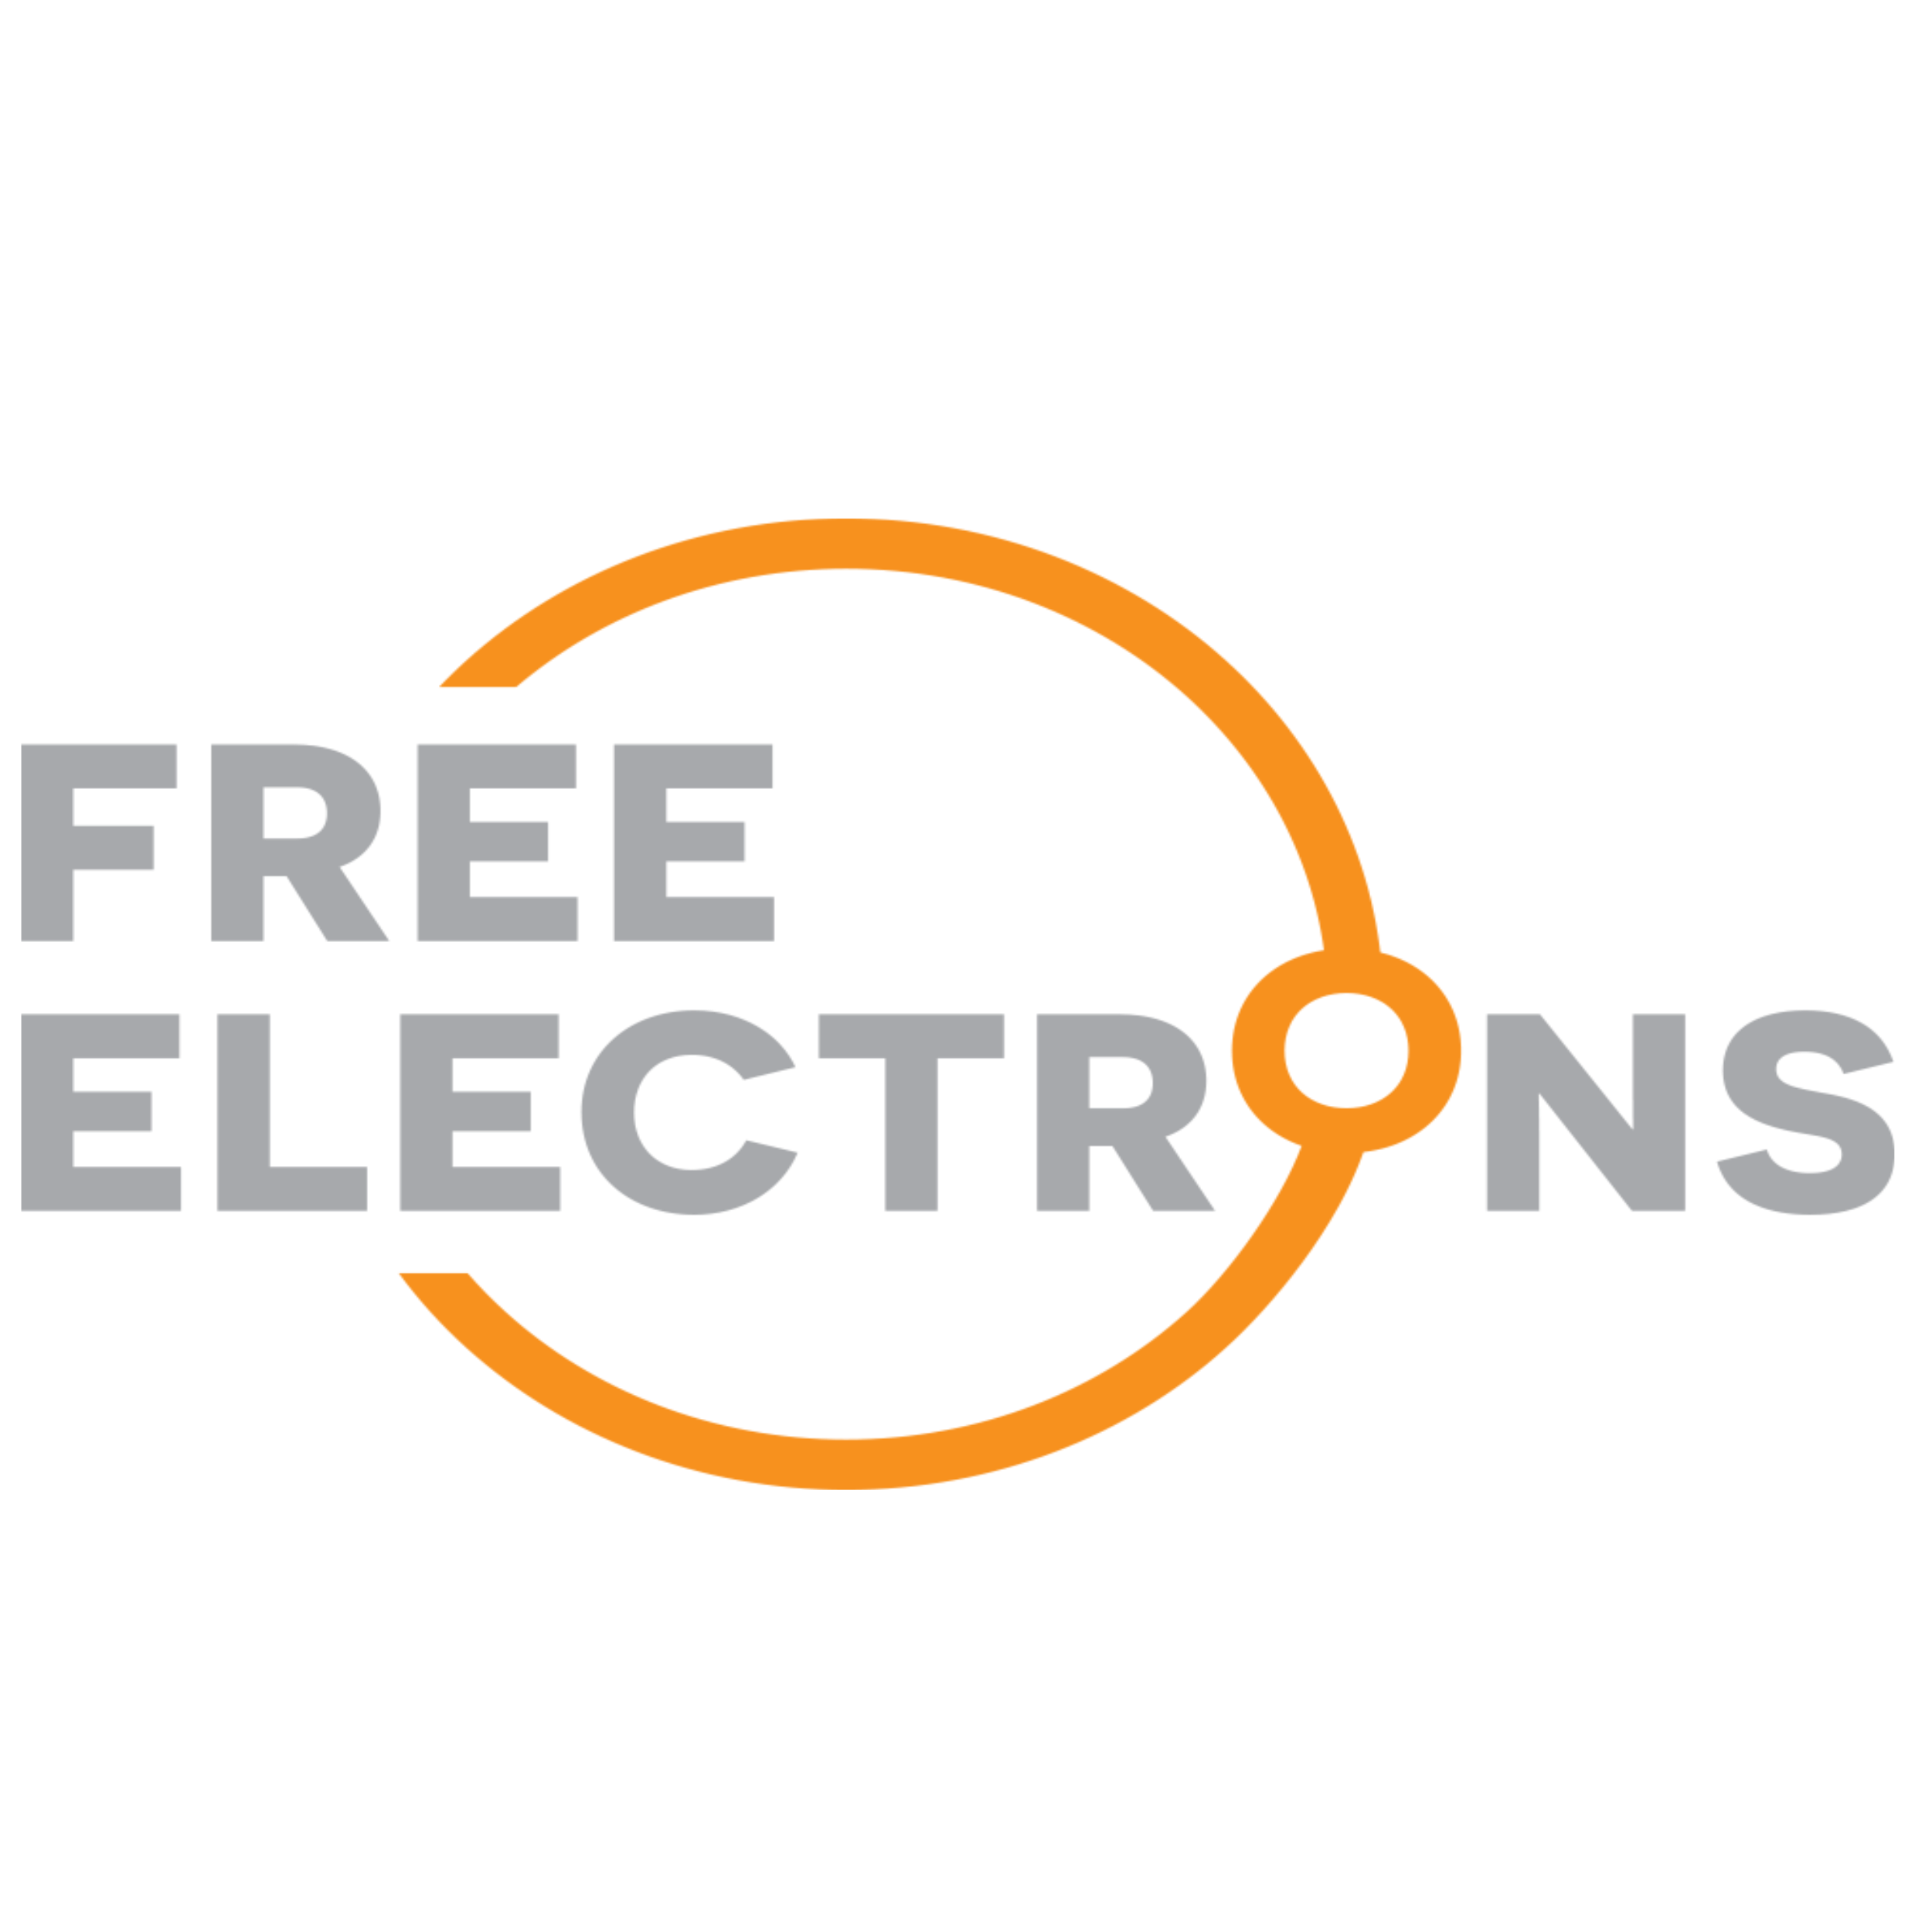 Free-Electrons-logo web.png